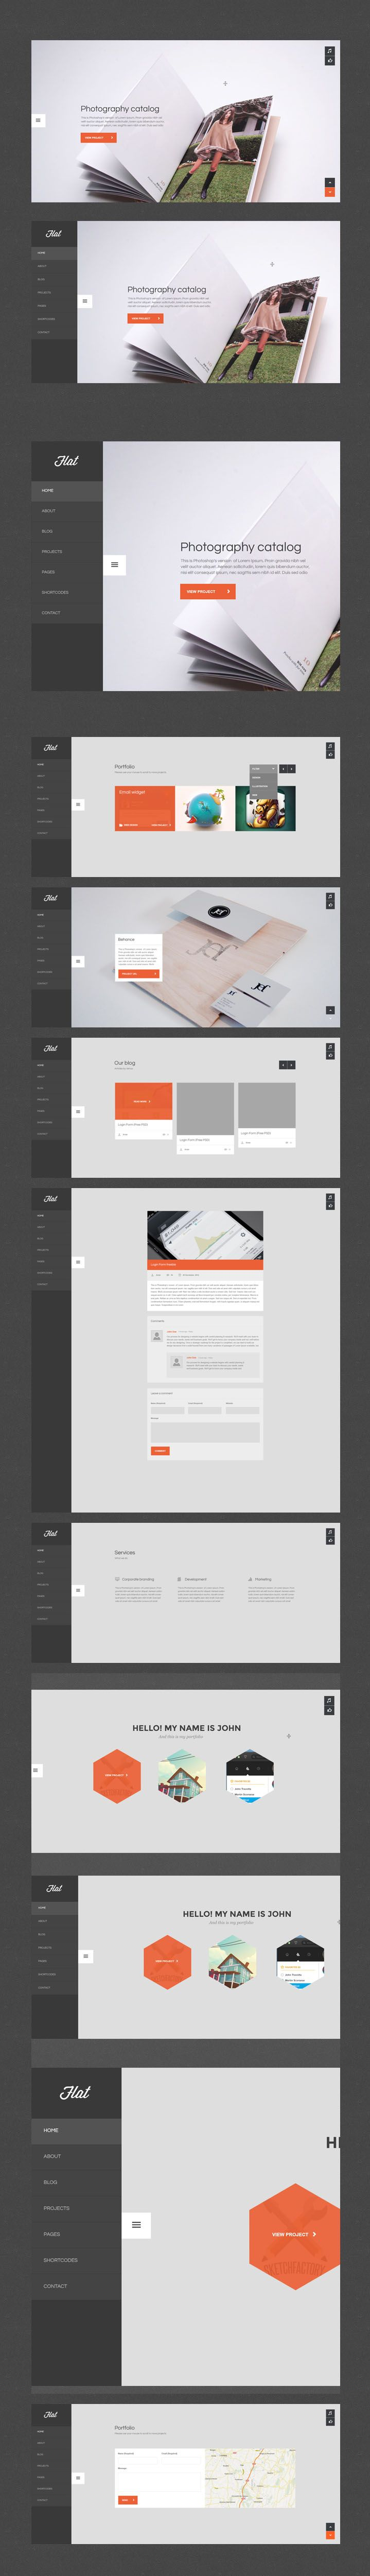 Flat UI Webdesign | #webdesign #flatui